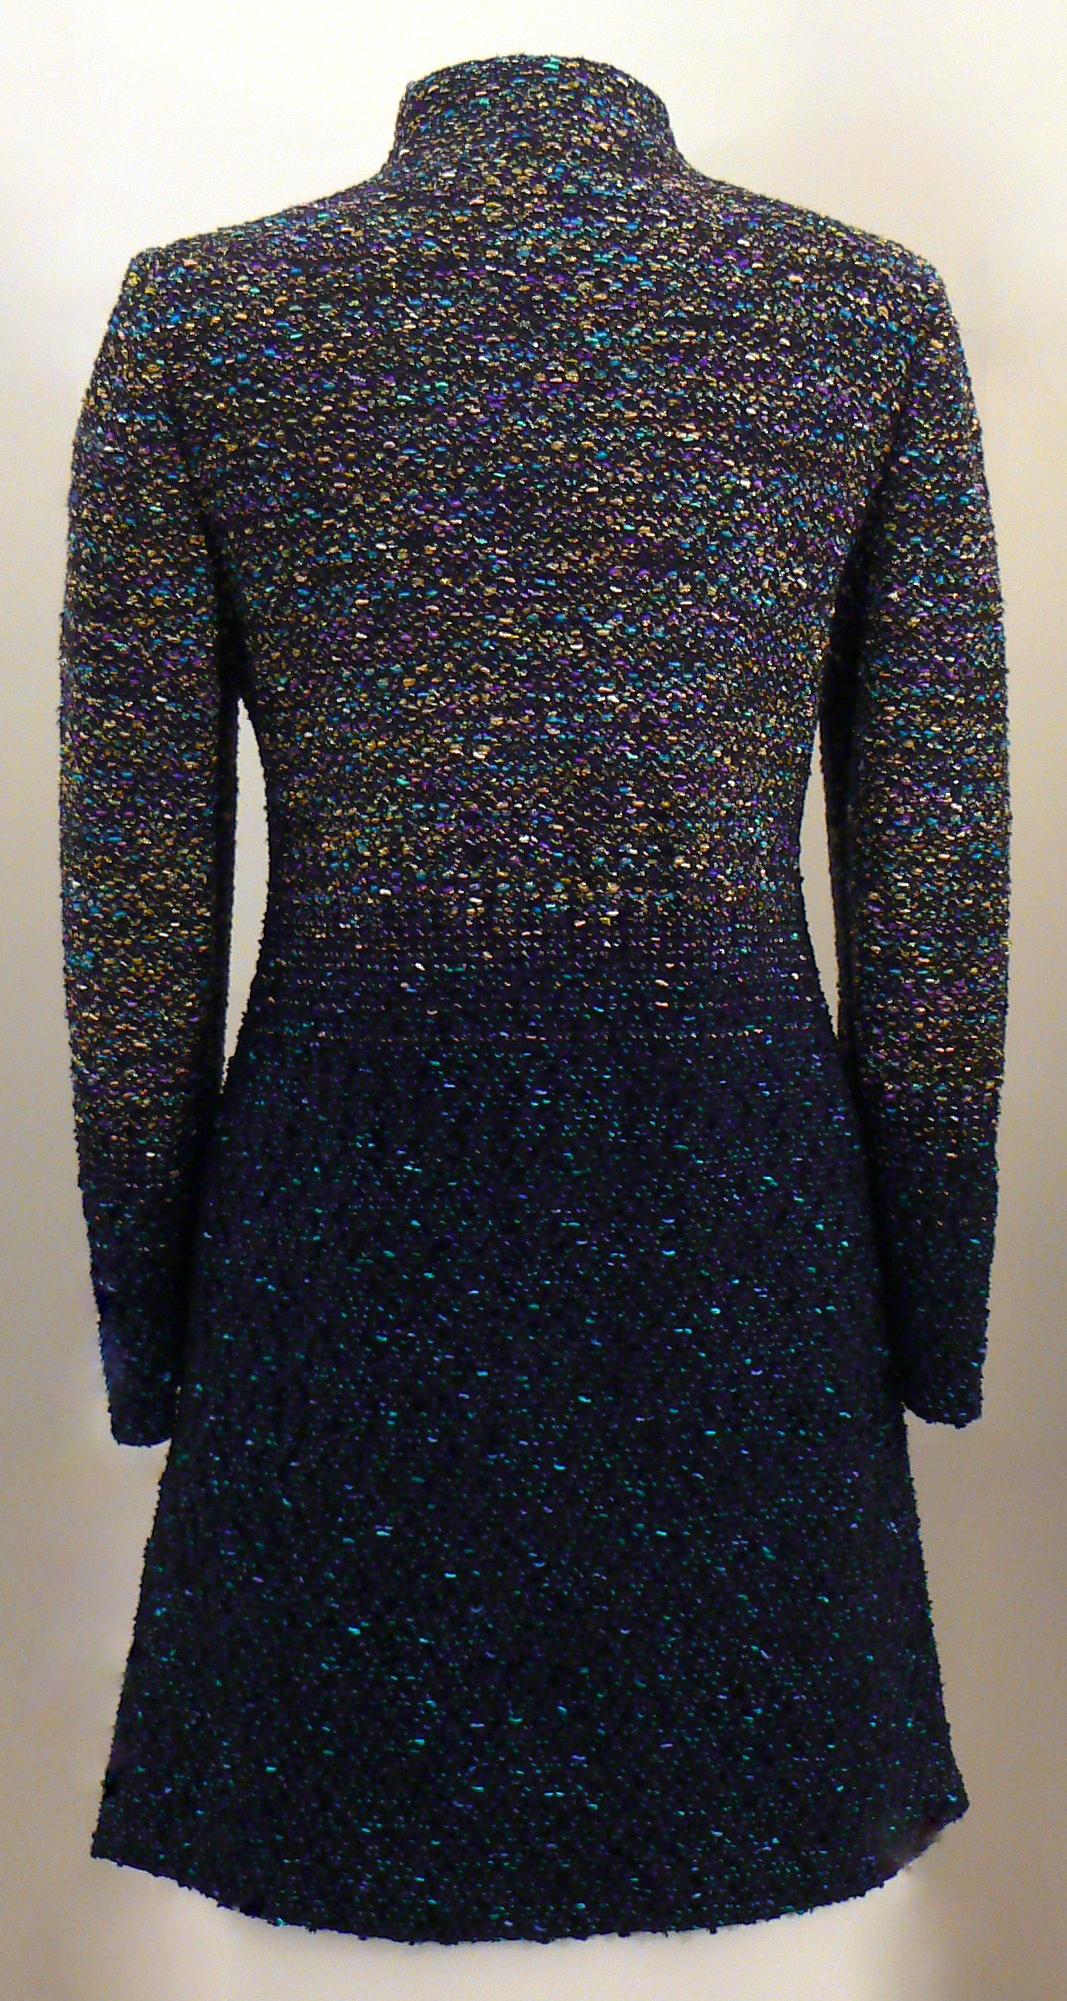 Handwoven Clothing, Coats, Kathleen Weir-West, 17-001.JPG